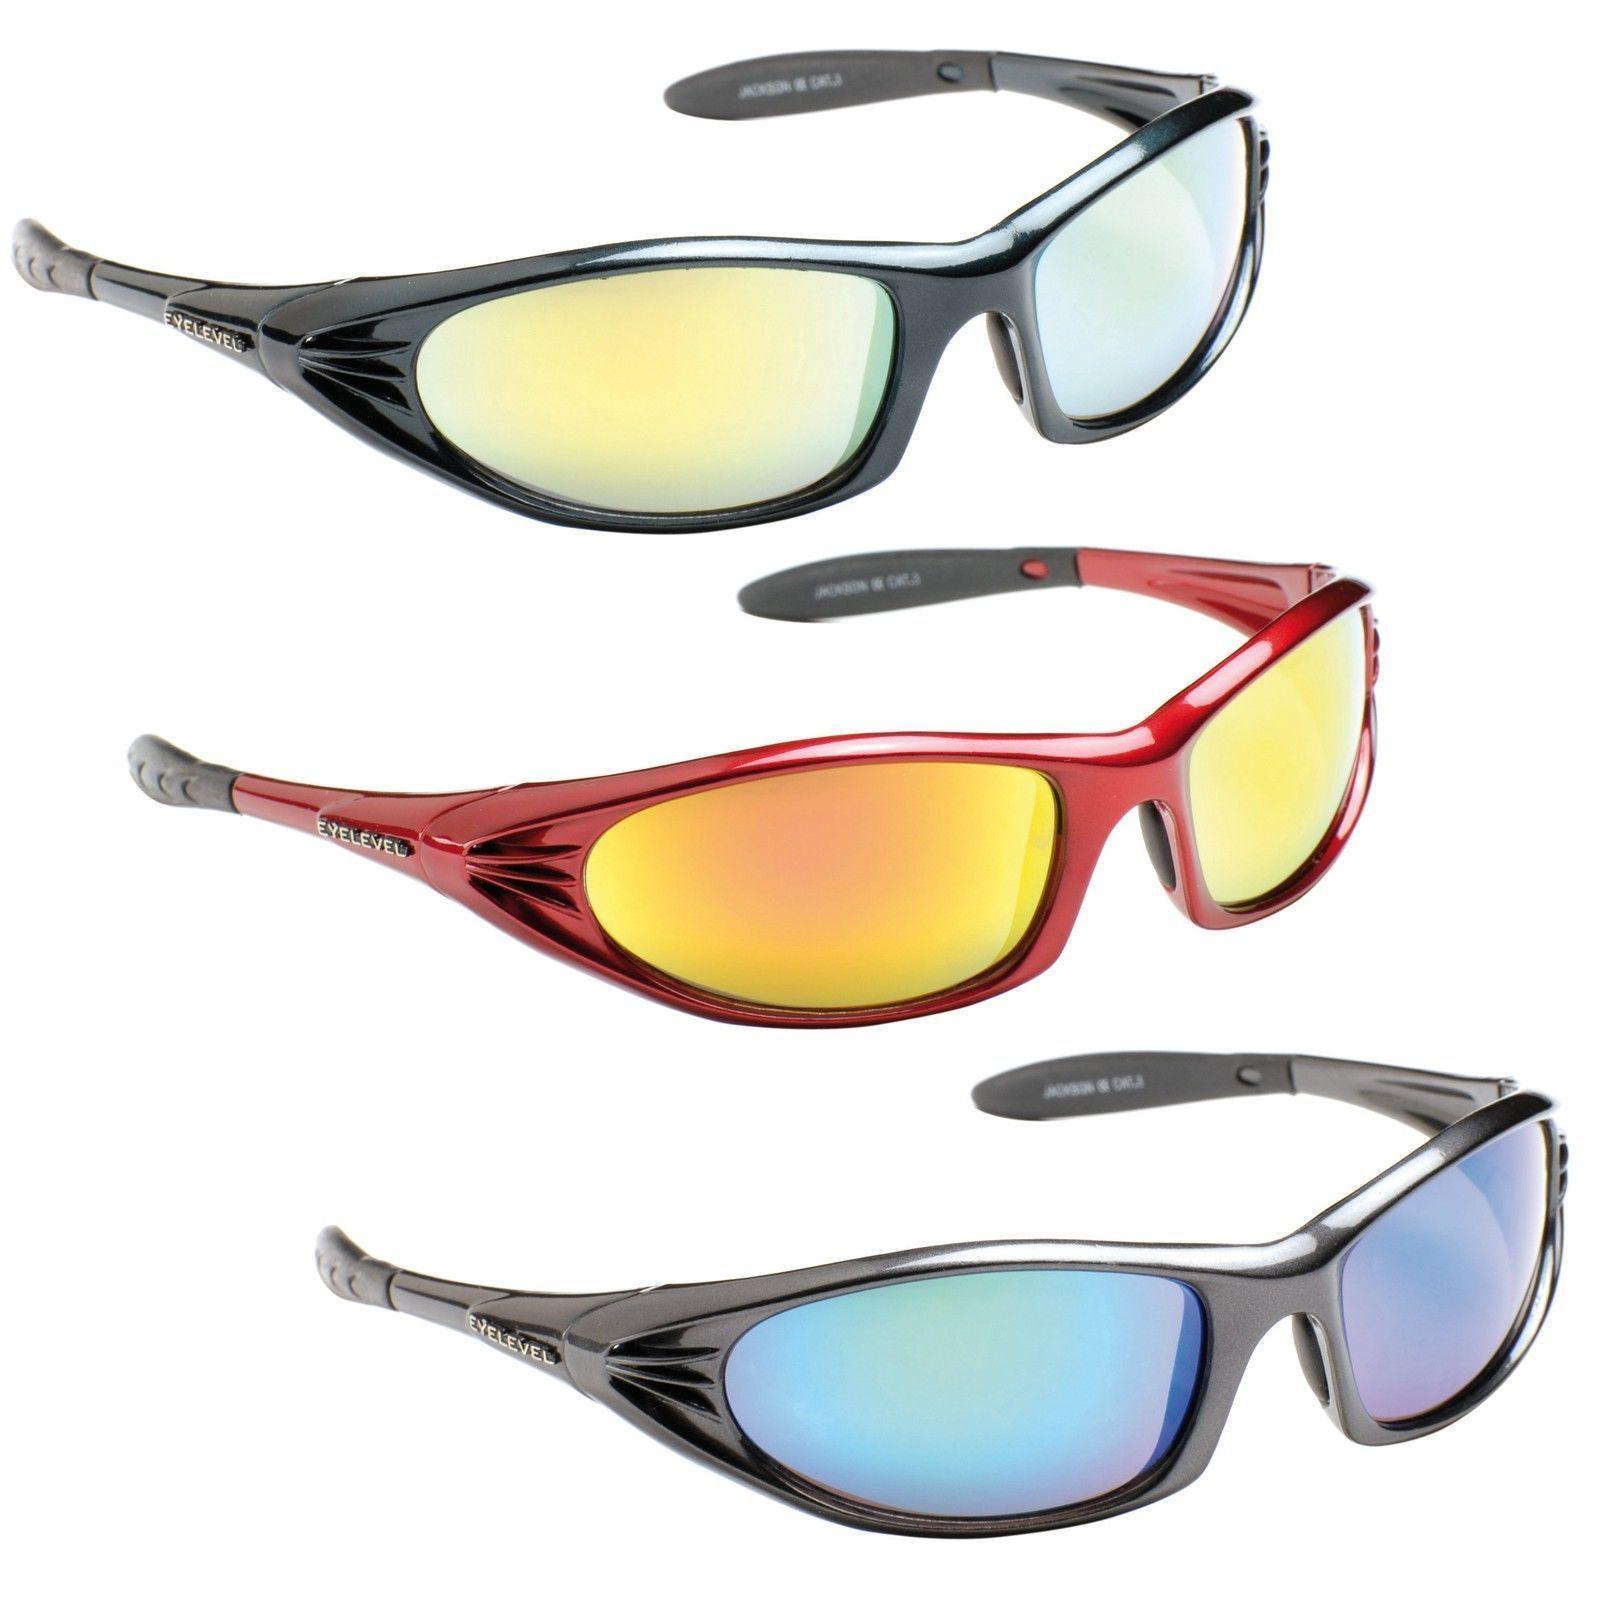 612a4db01b3 uv400-eyelevel-polarized-jackson-sport-wrap-around-mirror-sunglasses -red-blue-1289-p.jpg